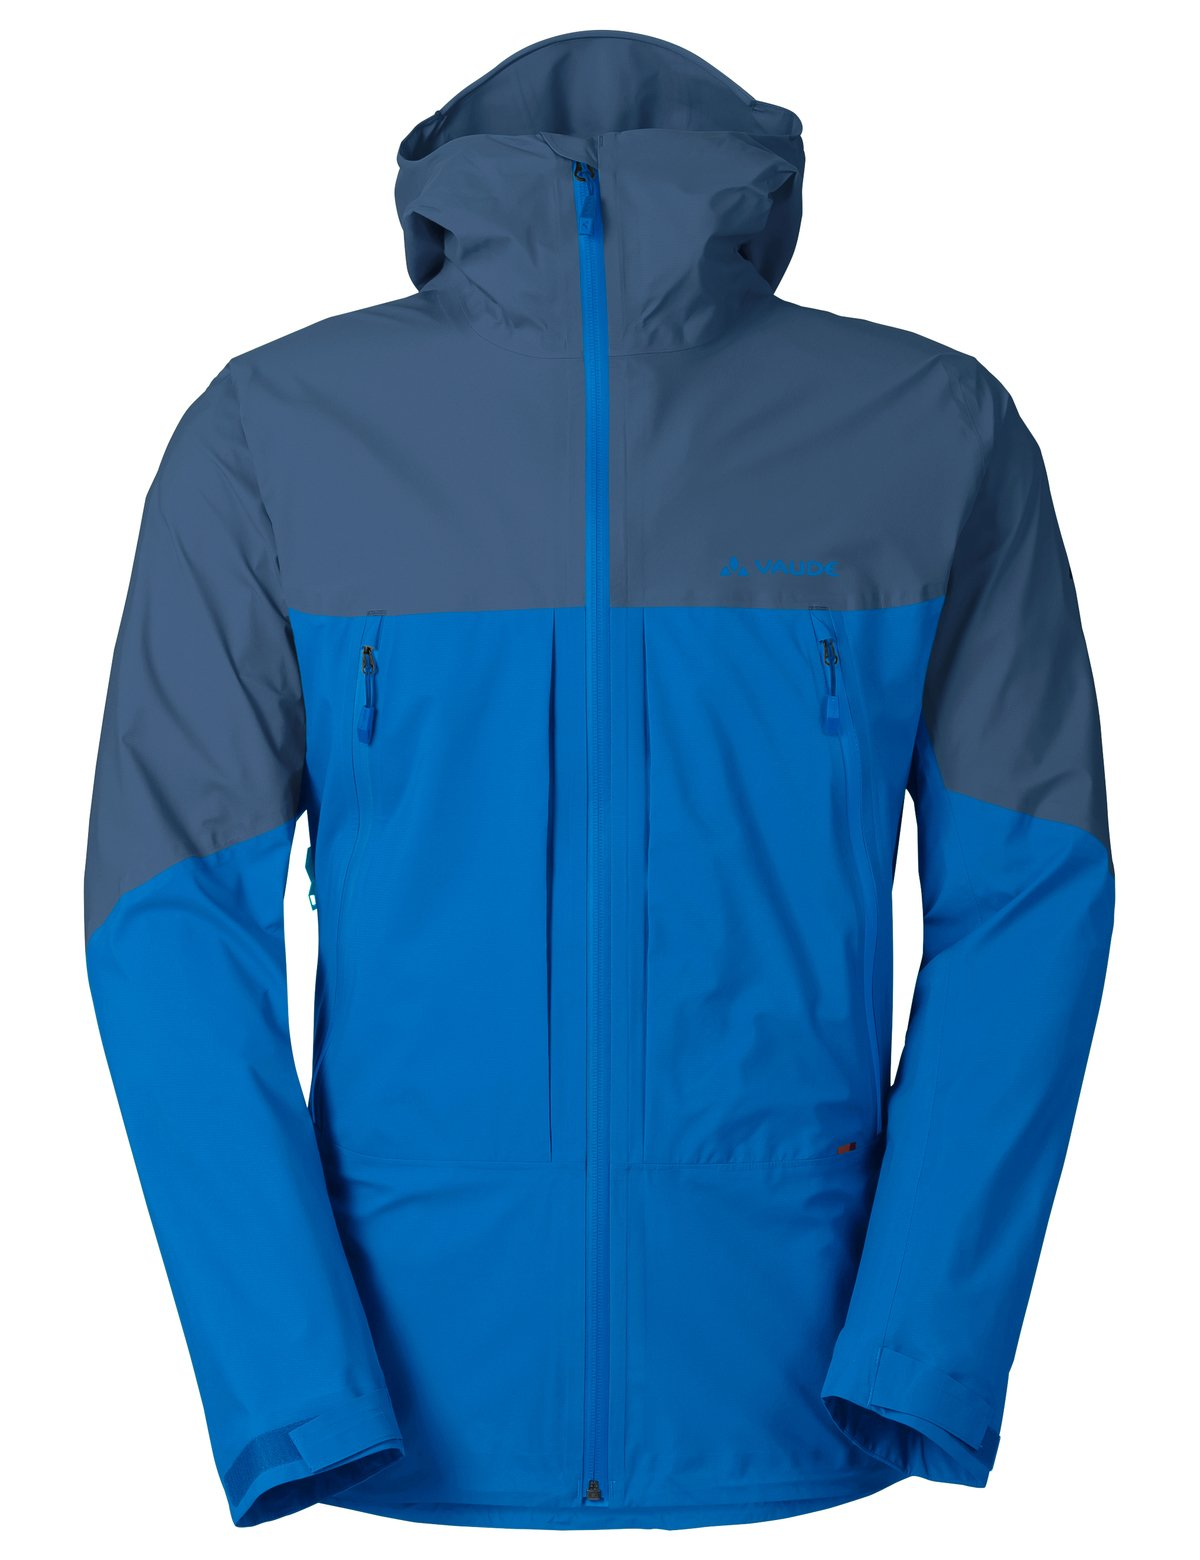 VAUDE Men's Croz 3L Jacket, Radiate Blue, Medium